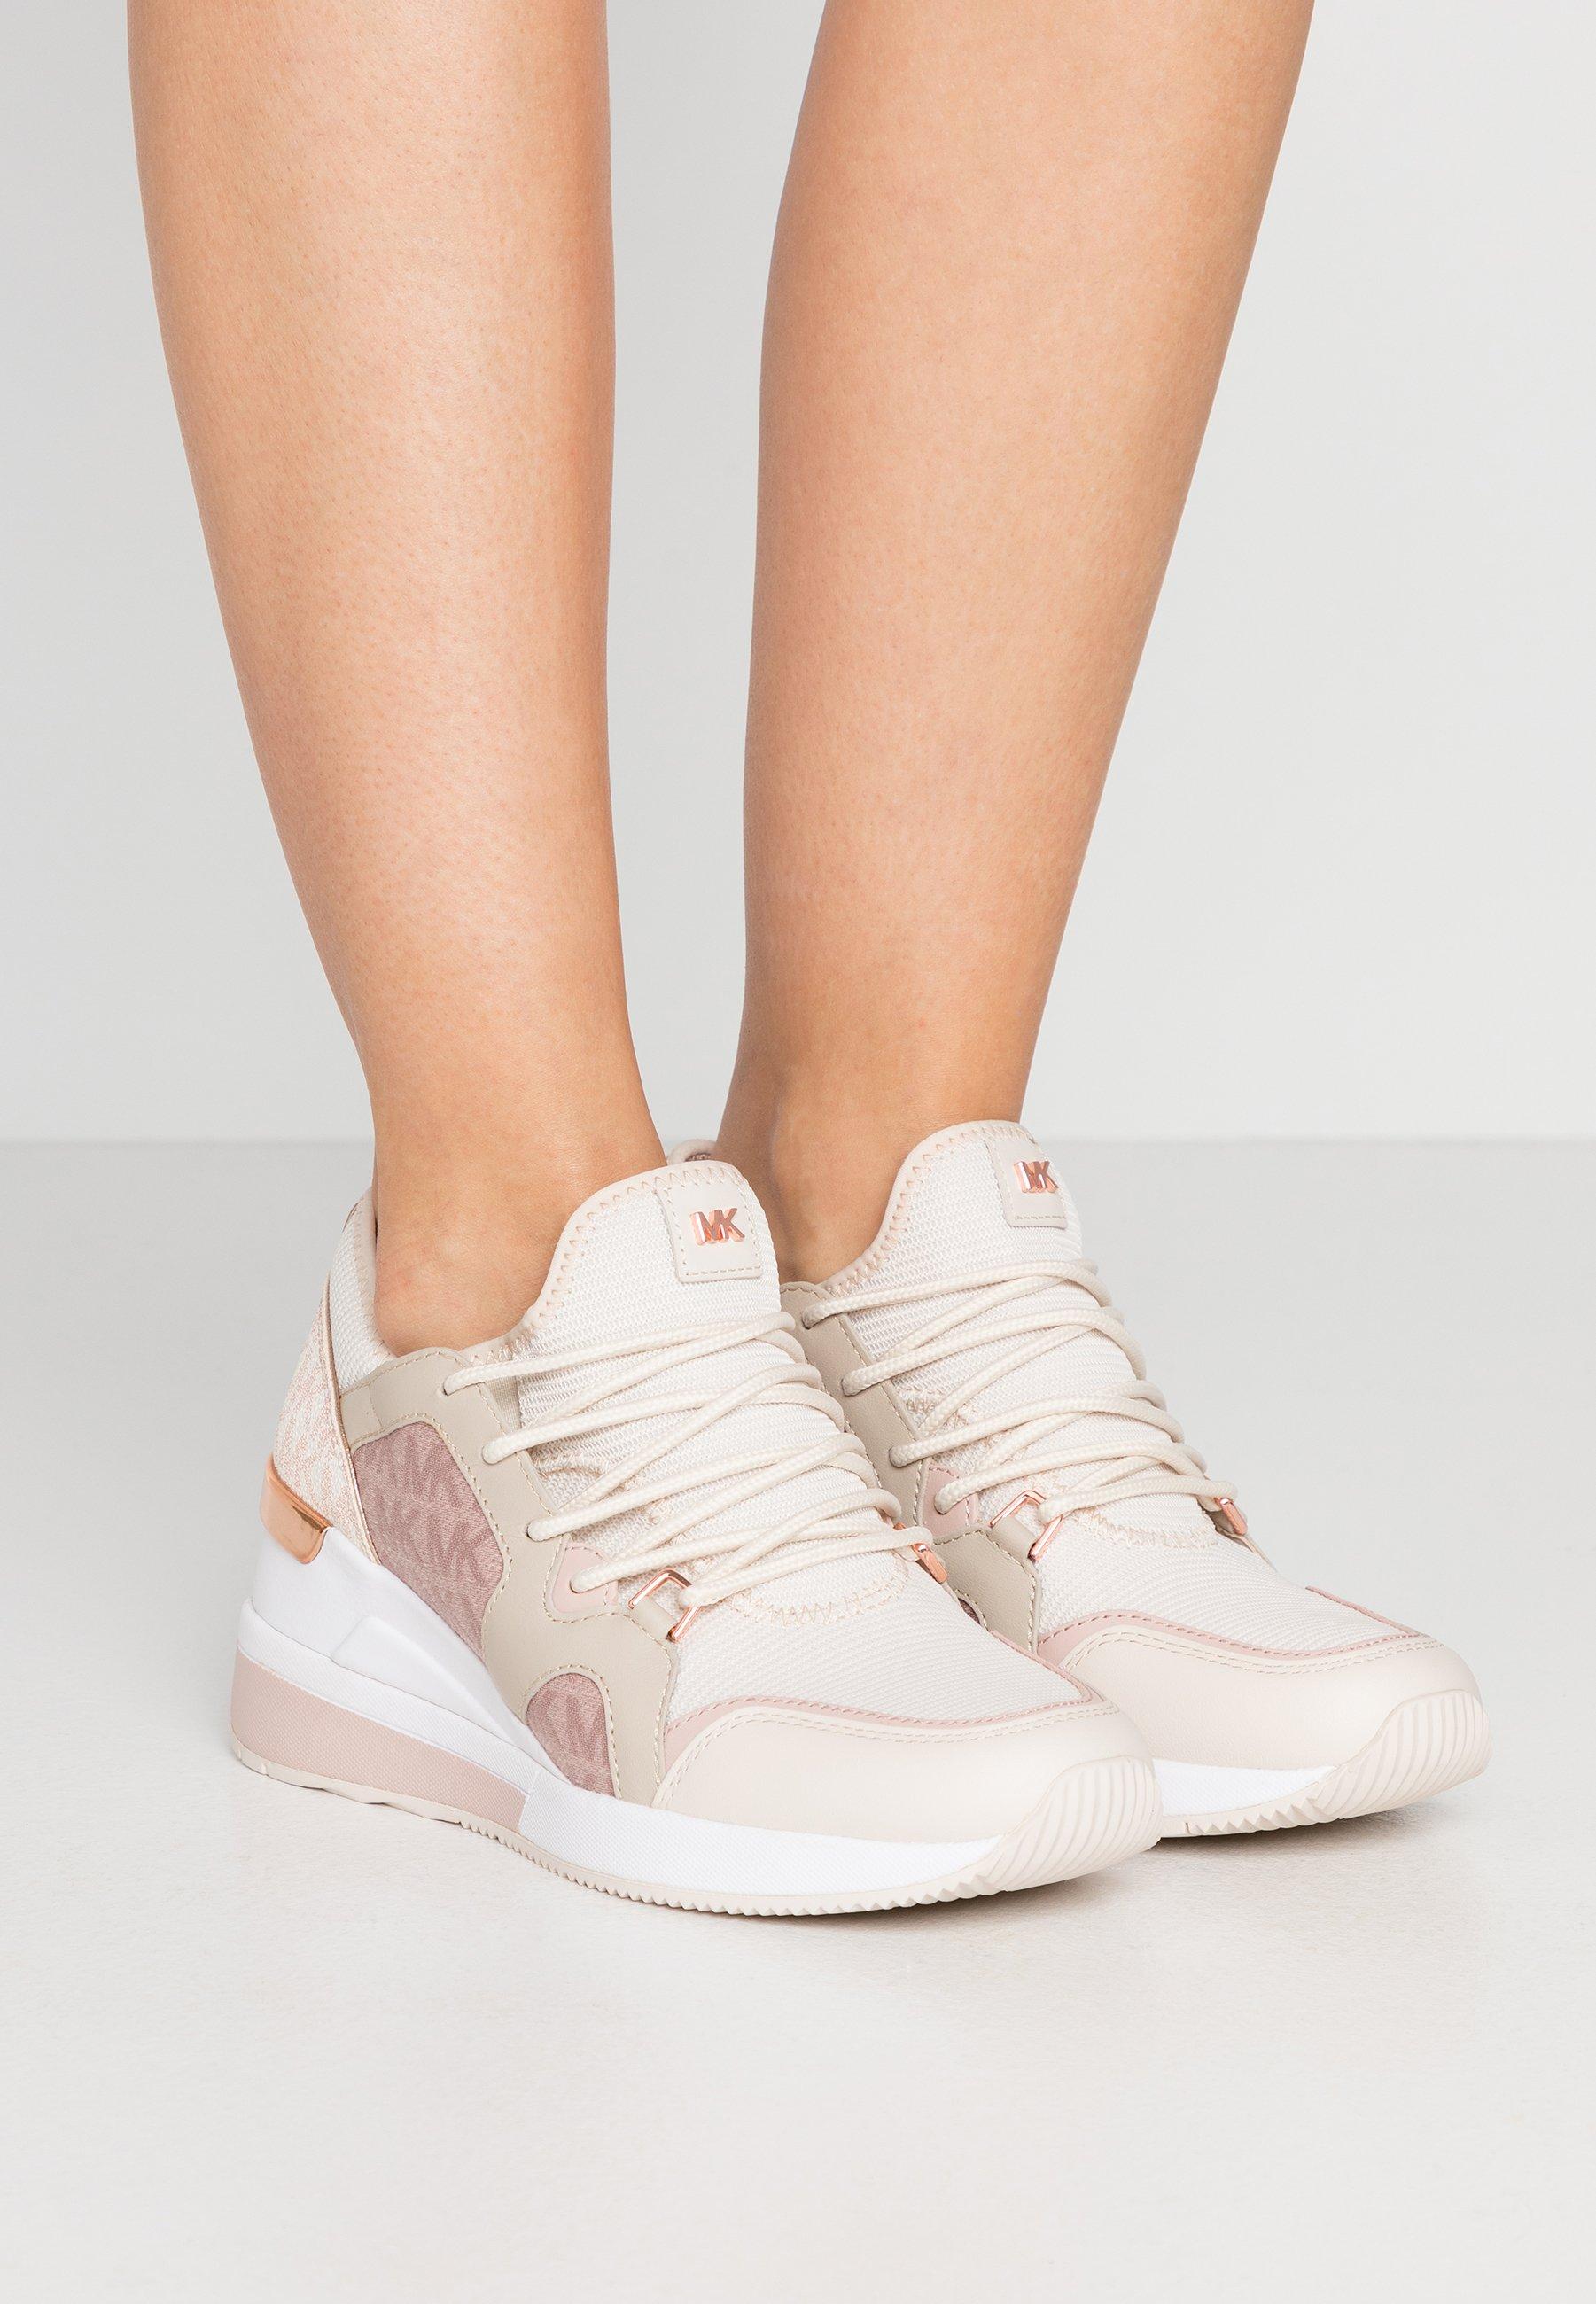 LIV TRAINER Sneakers light crimsonmulticolor